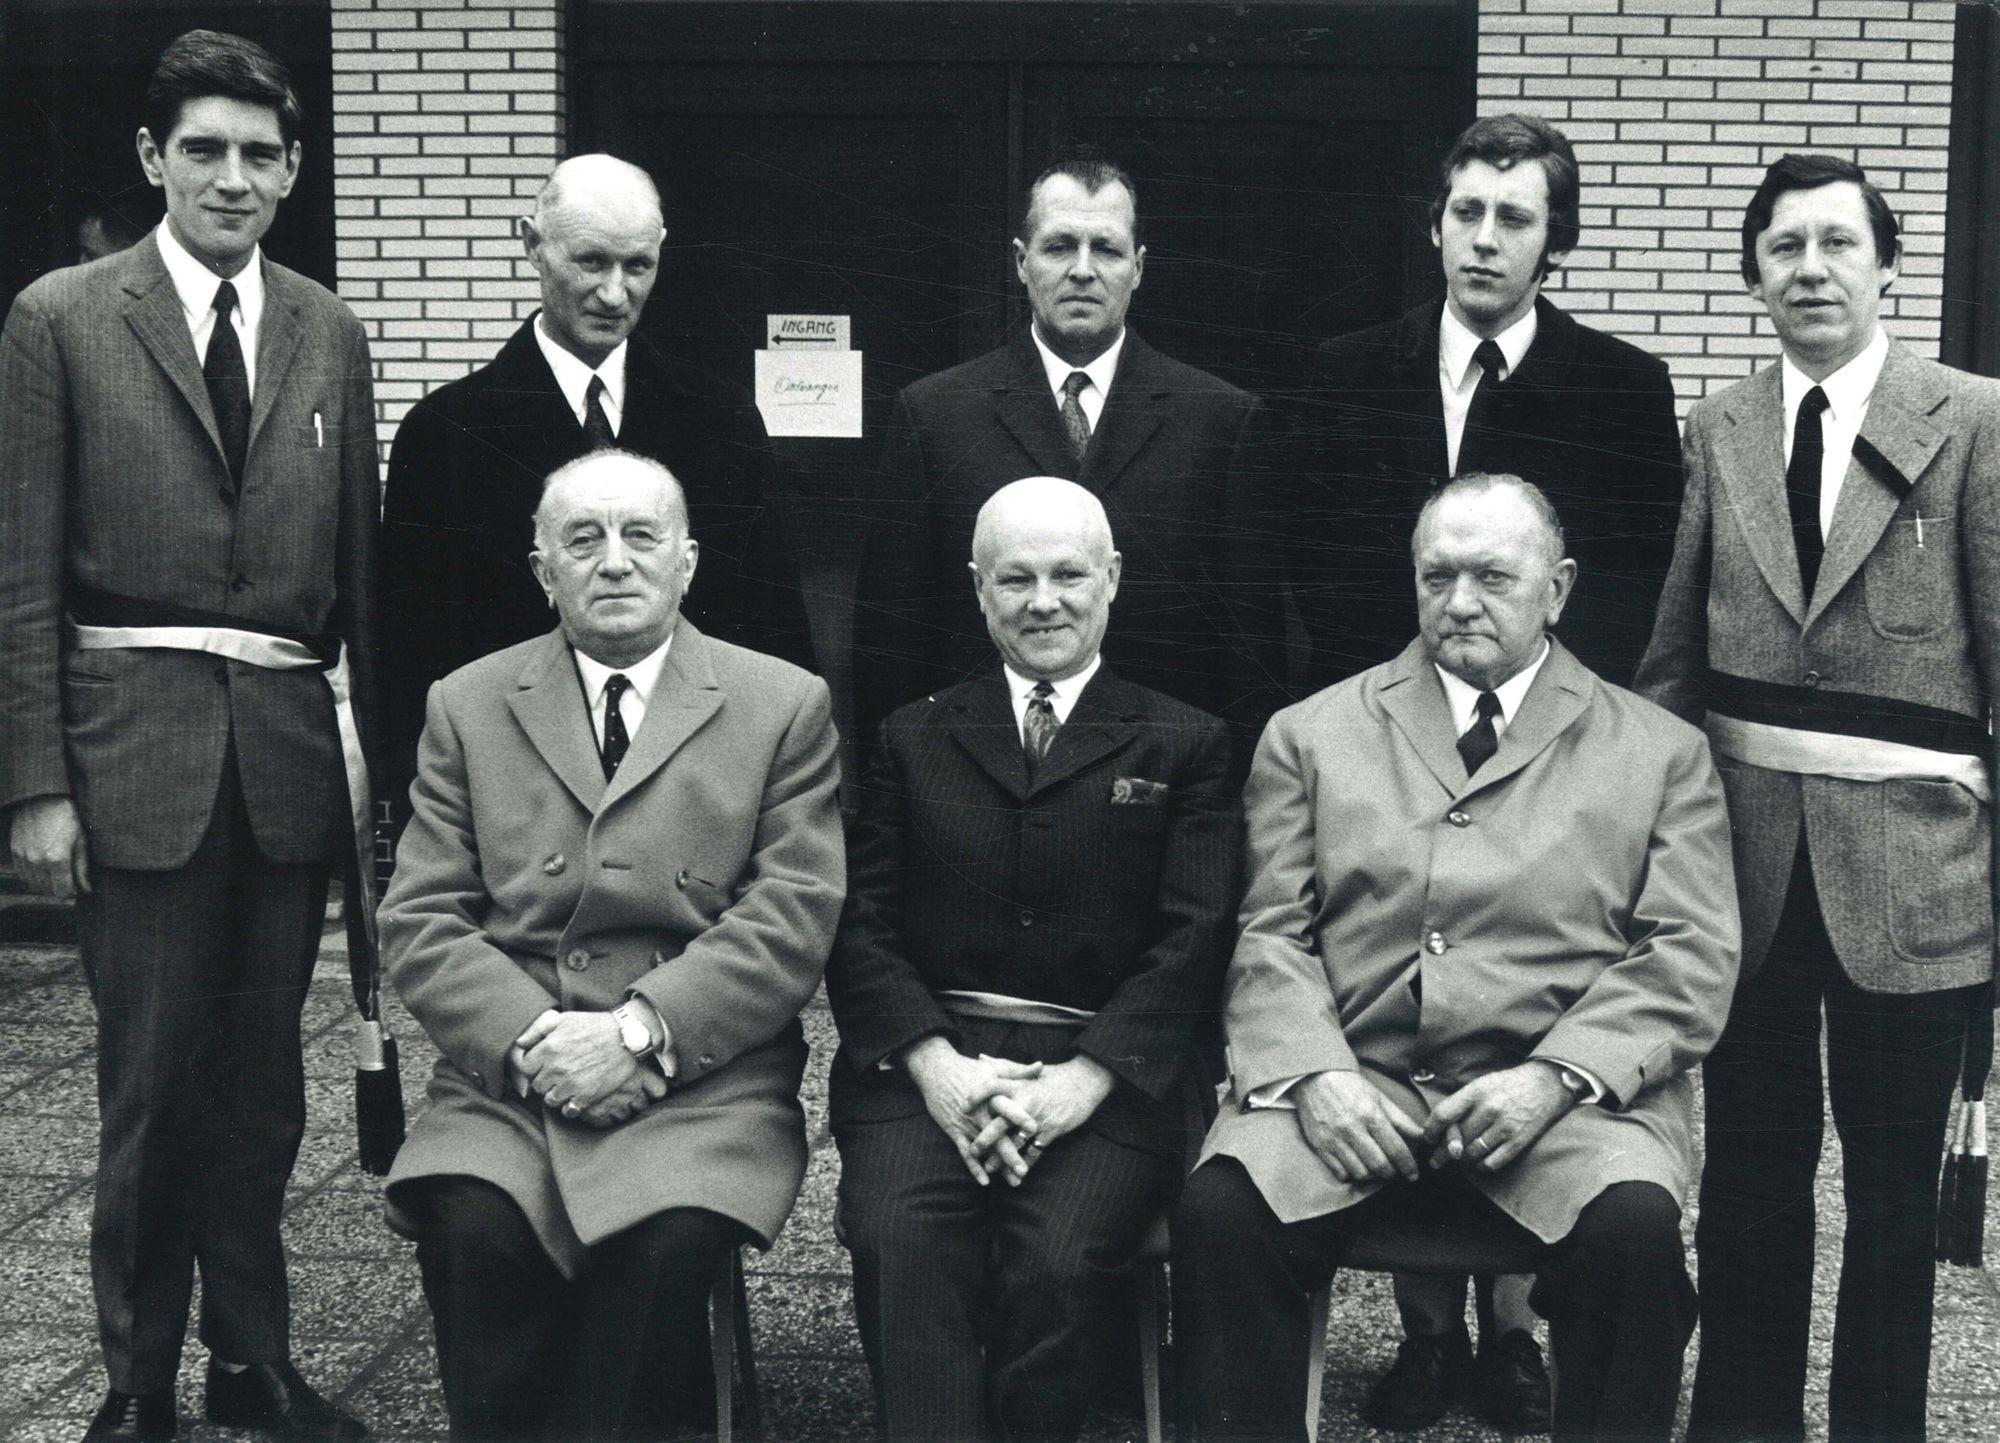 Burgemeester André Debackere